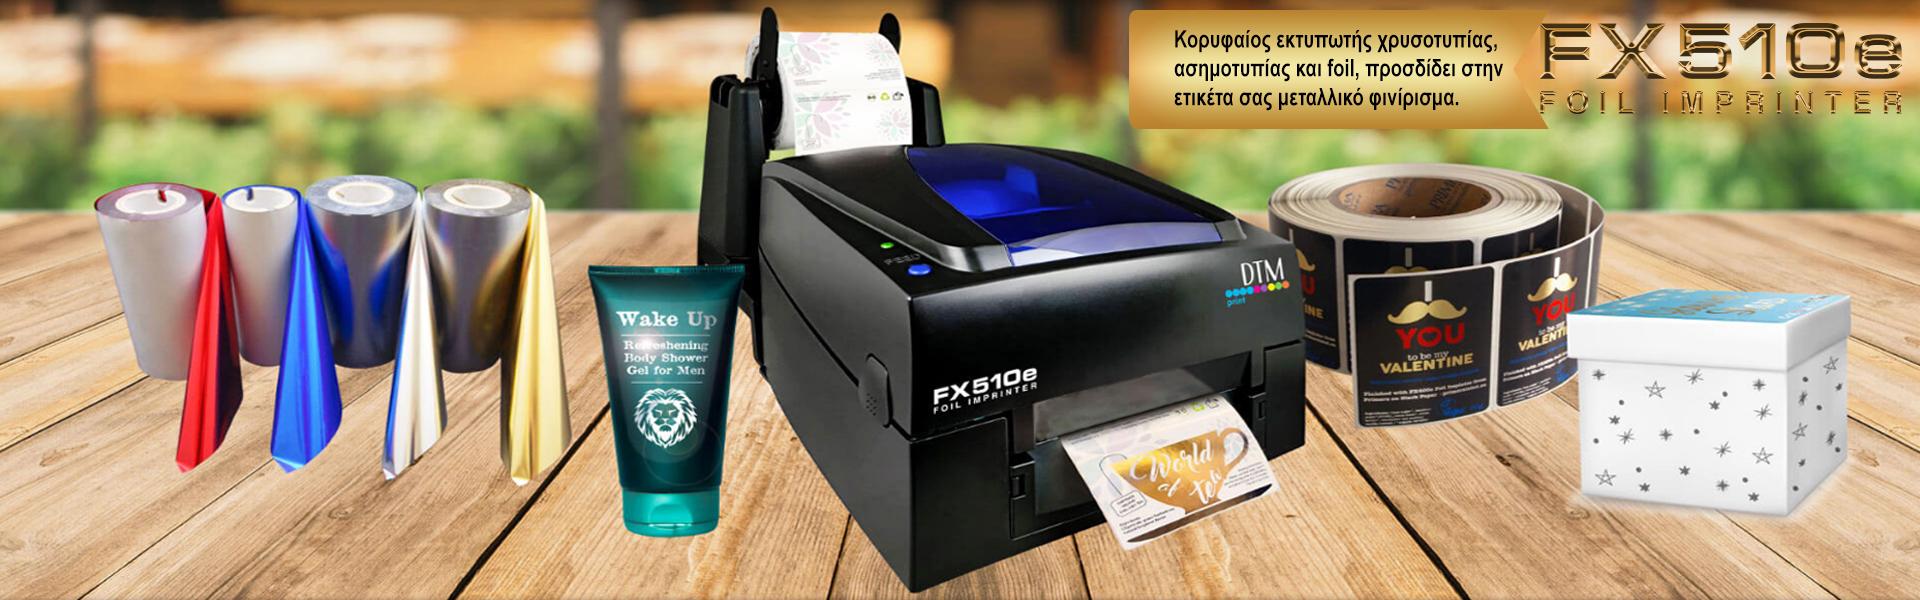 foil printer fx510e by DTM